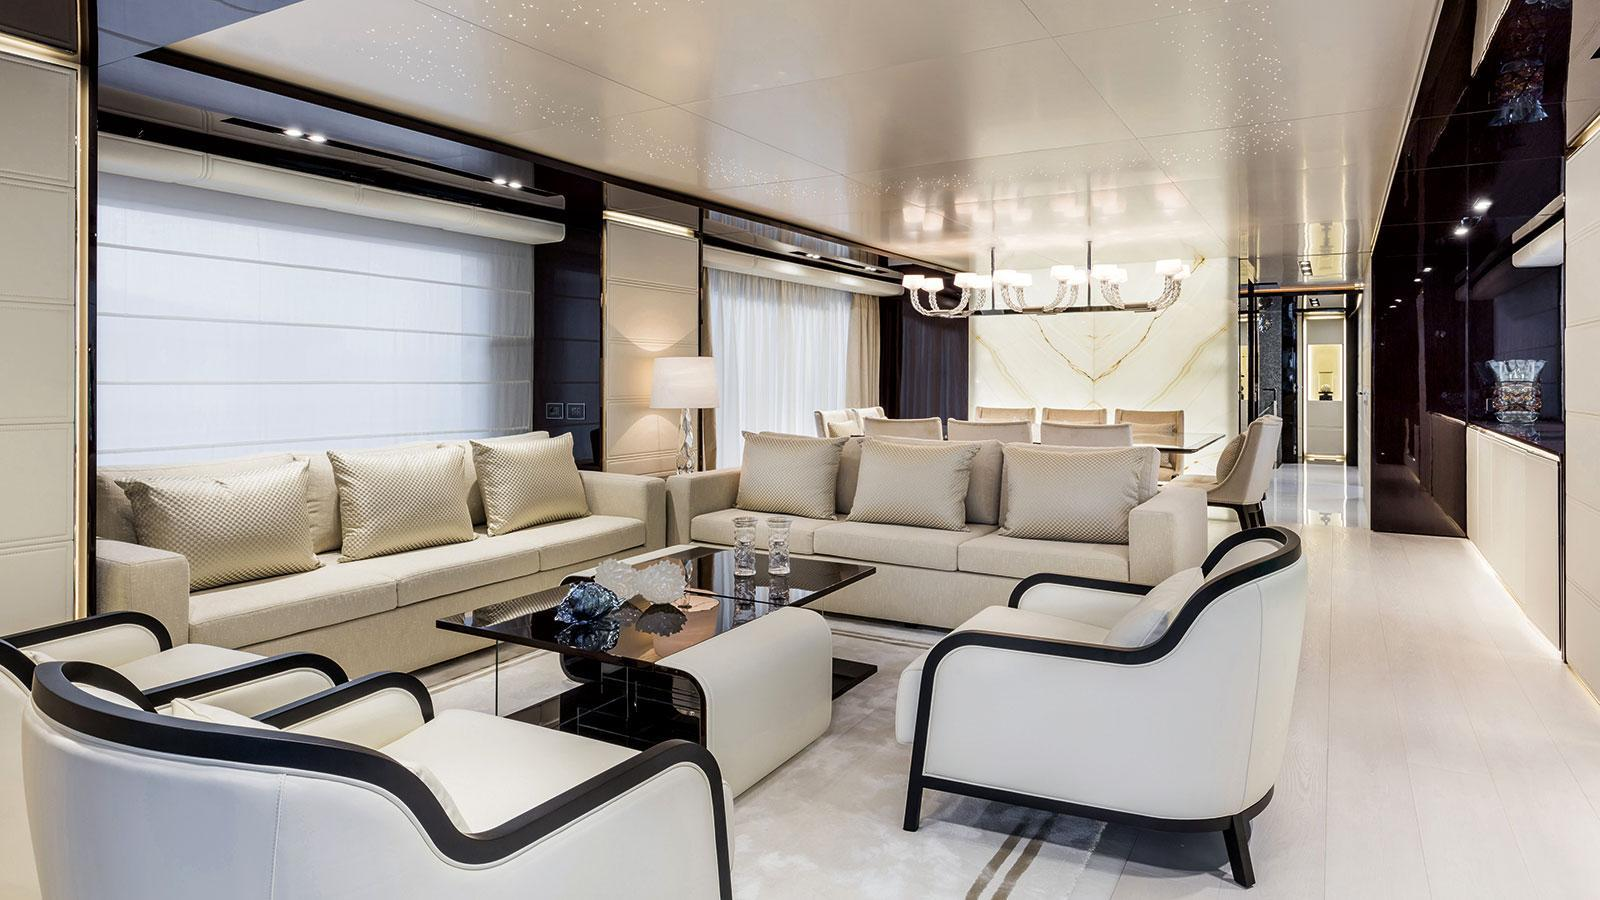 maryliz-motor-yacht-dl-2015-34m-saloon